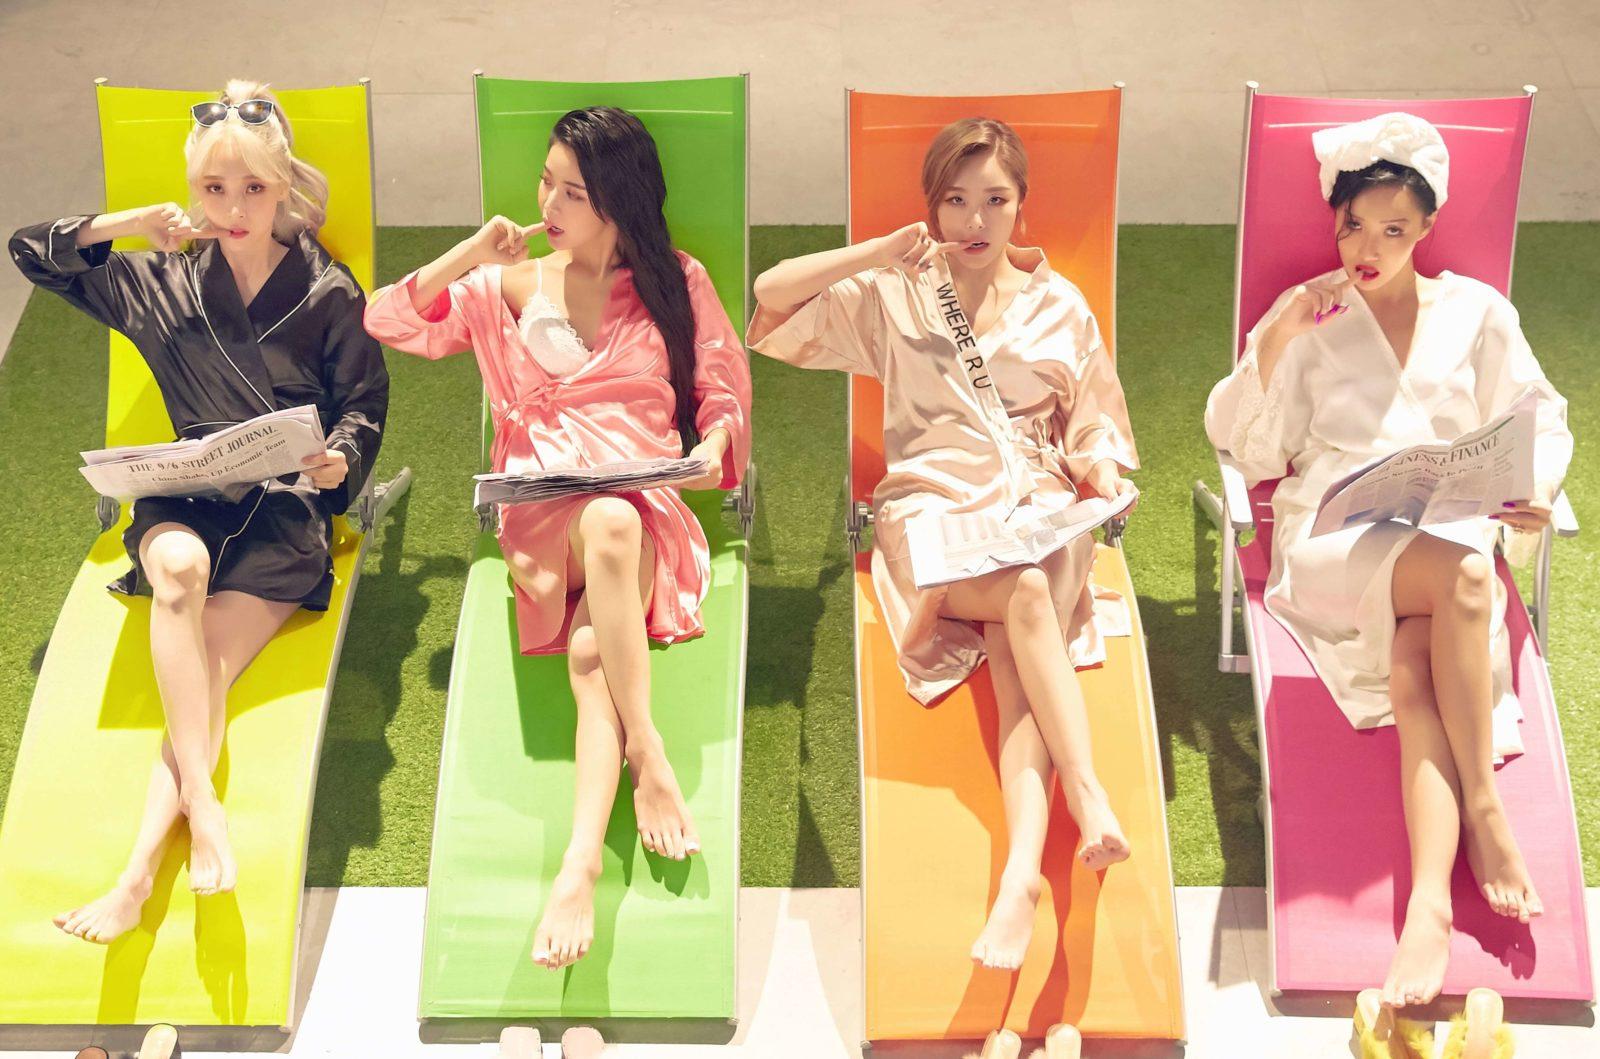 MAMAMOO「gogobebe -Japanese ver.-」のダンス動画が初公開サムネイル画像